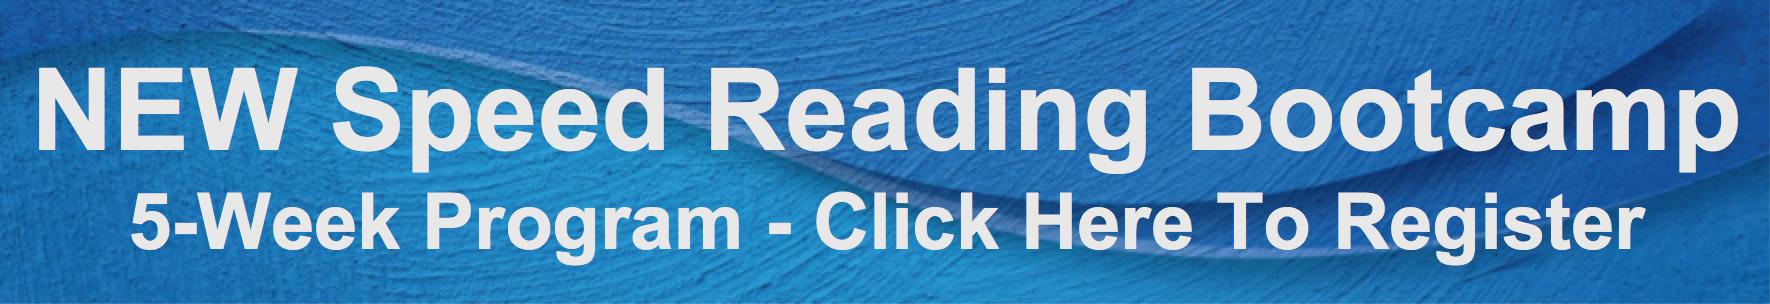 Speed Reading Bootcamp